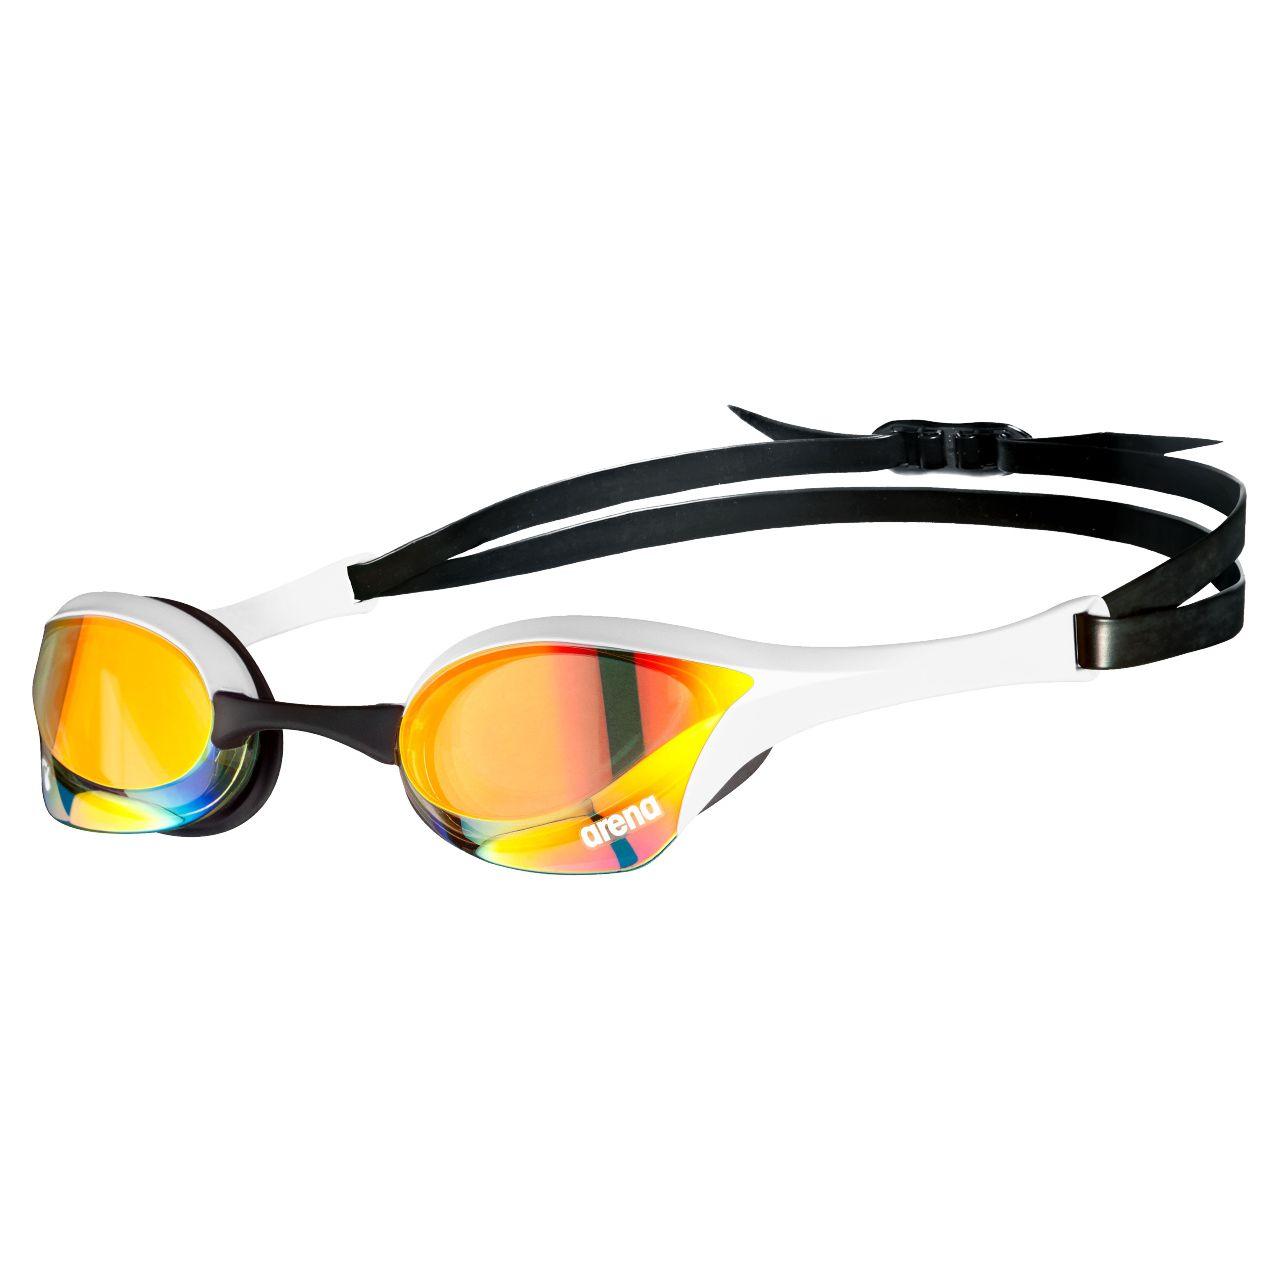 Goggles de Natación para Competición arena Unisex Cobra Ultra Swipe Mirror_76661